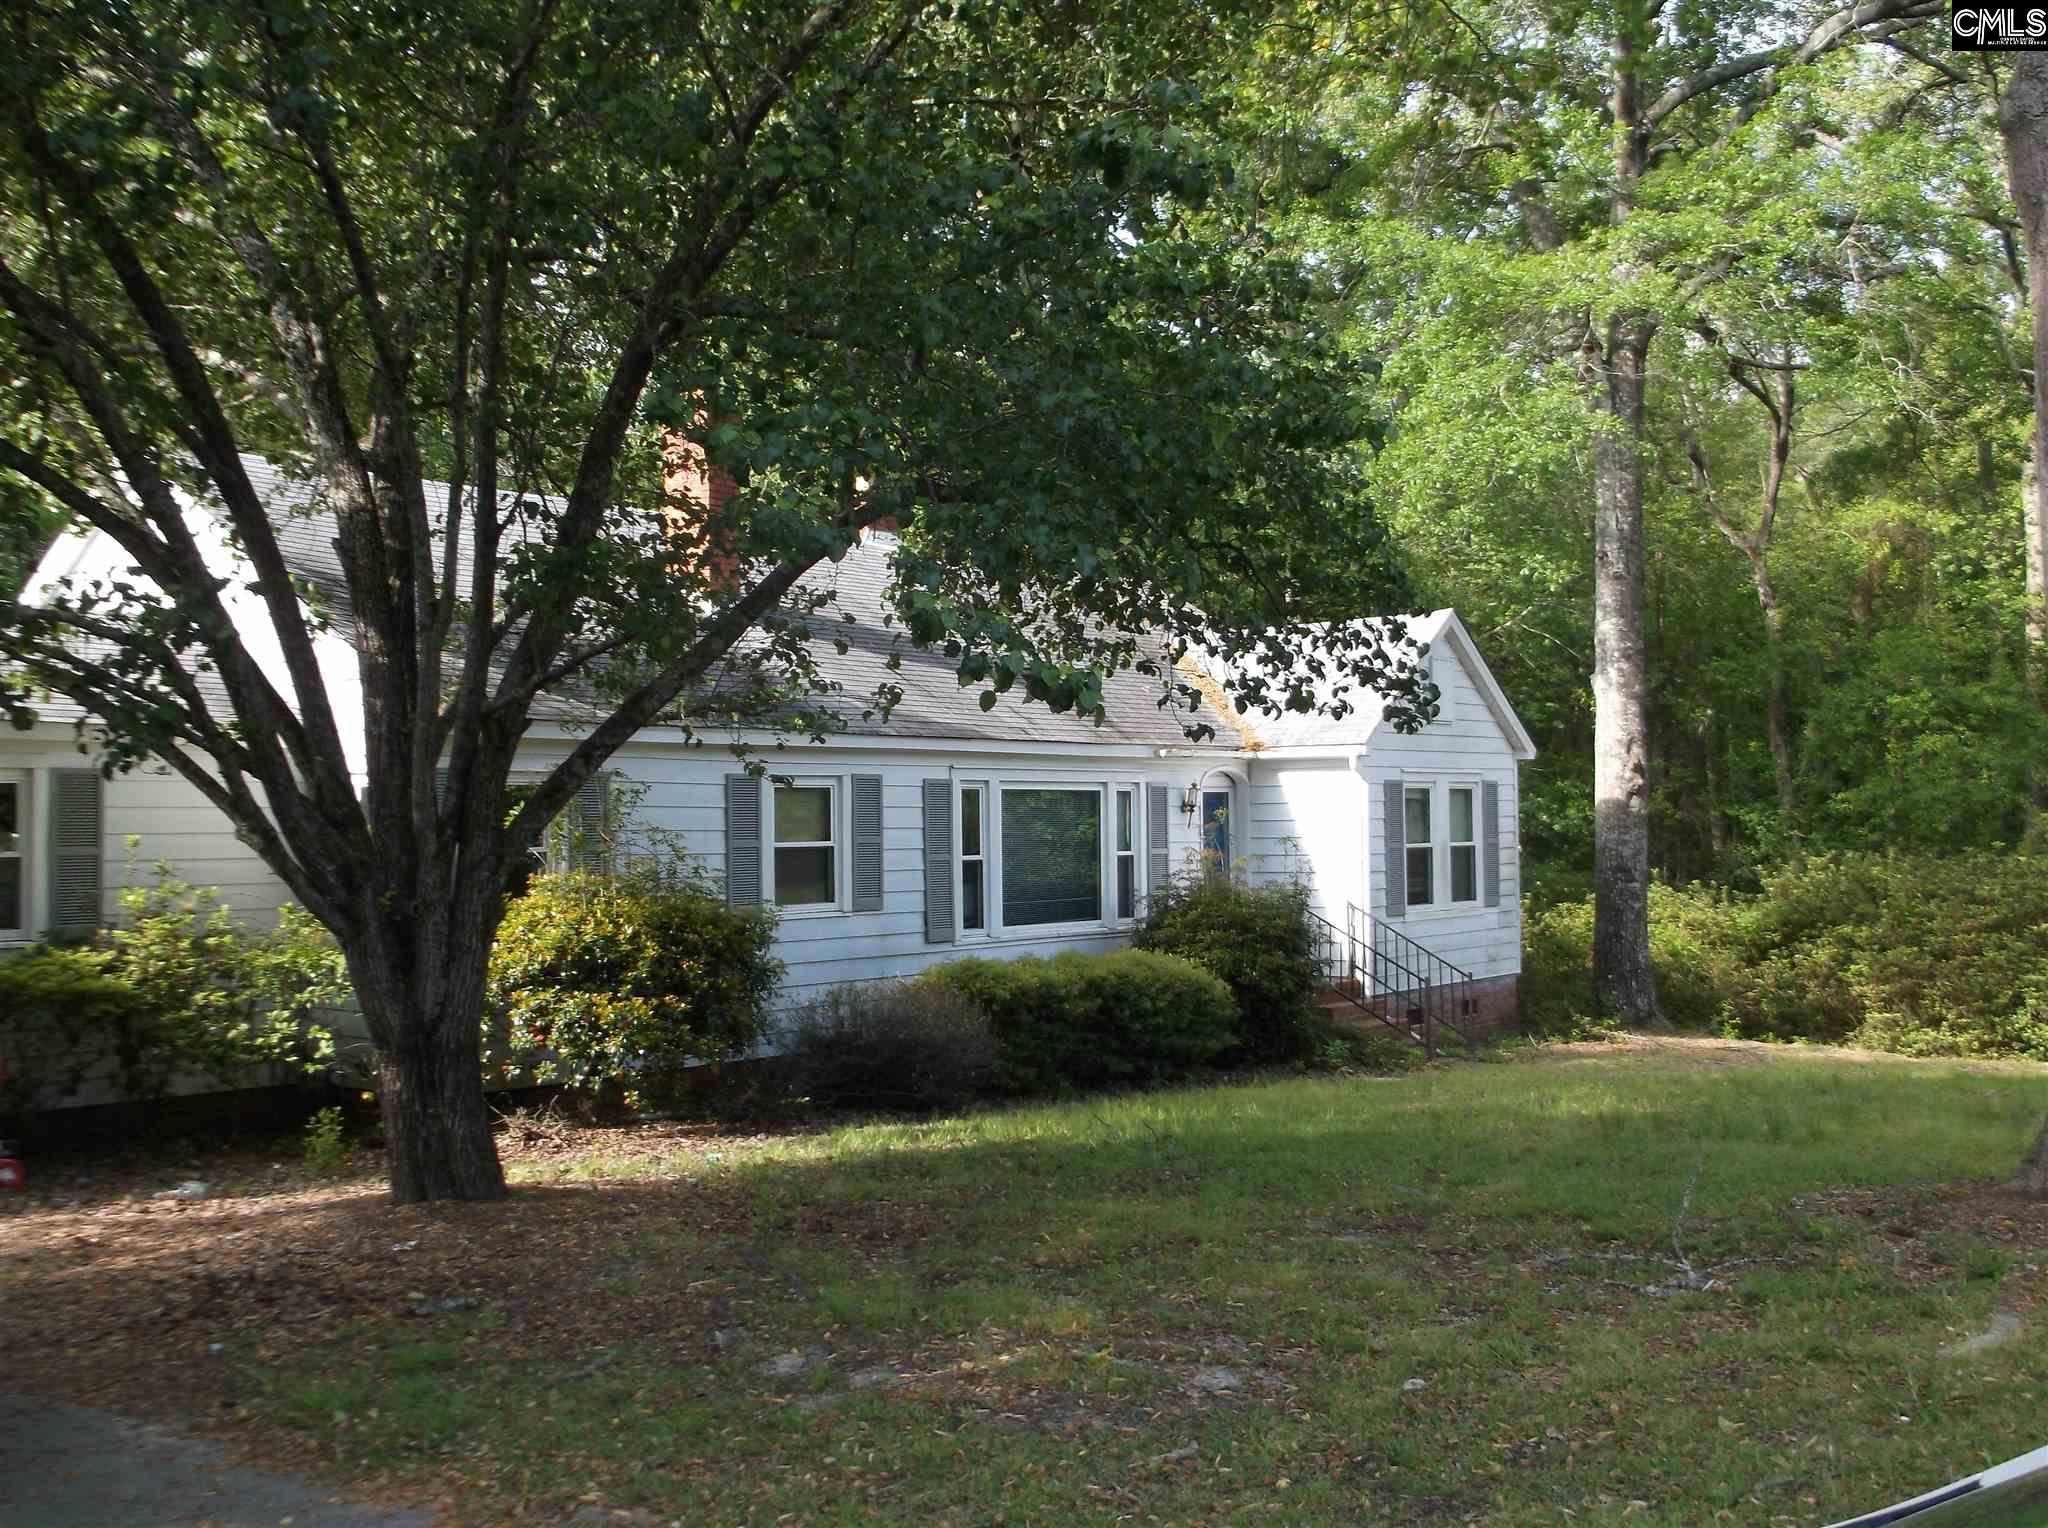 209 Elm Lexington, SC 29072